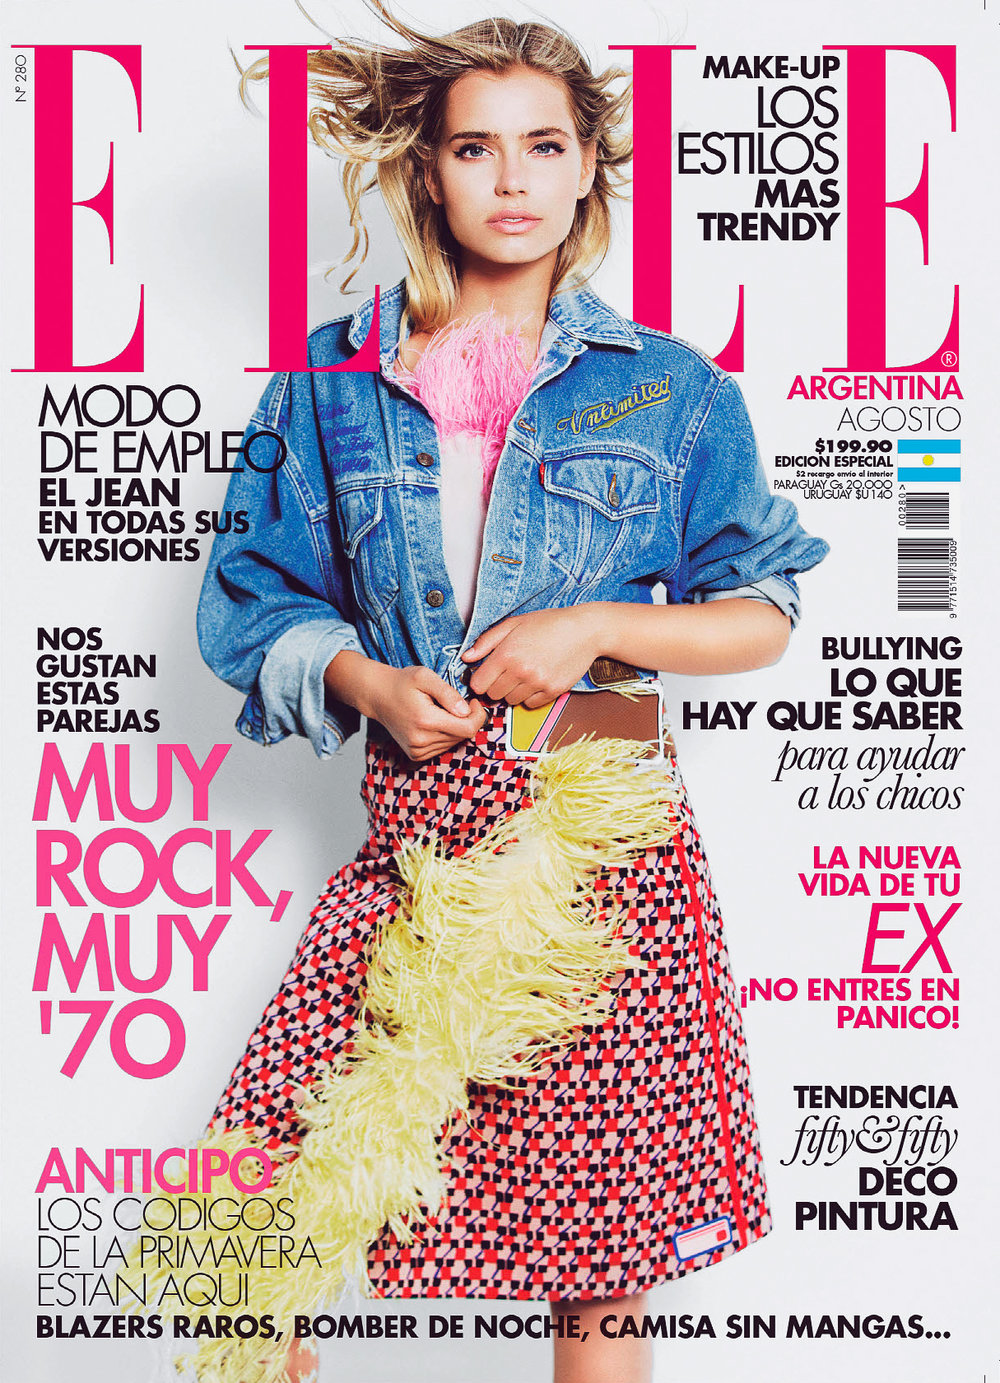 Elle Argentina Cover -